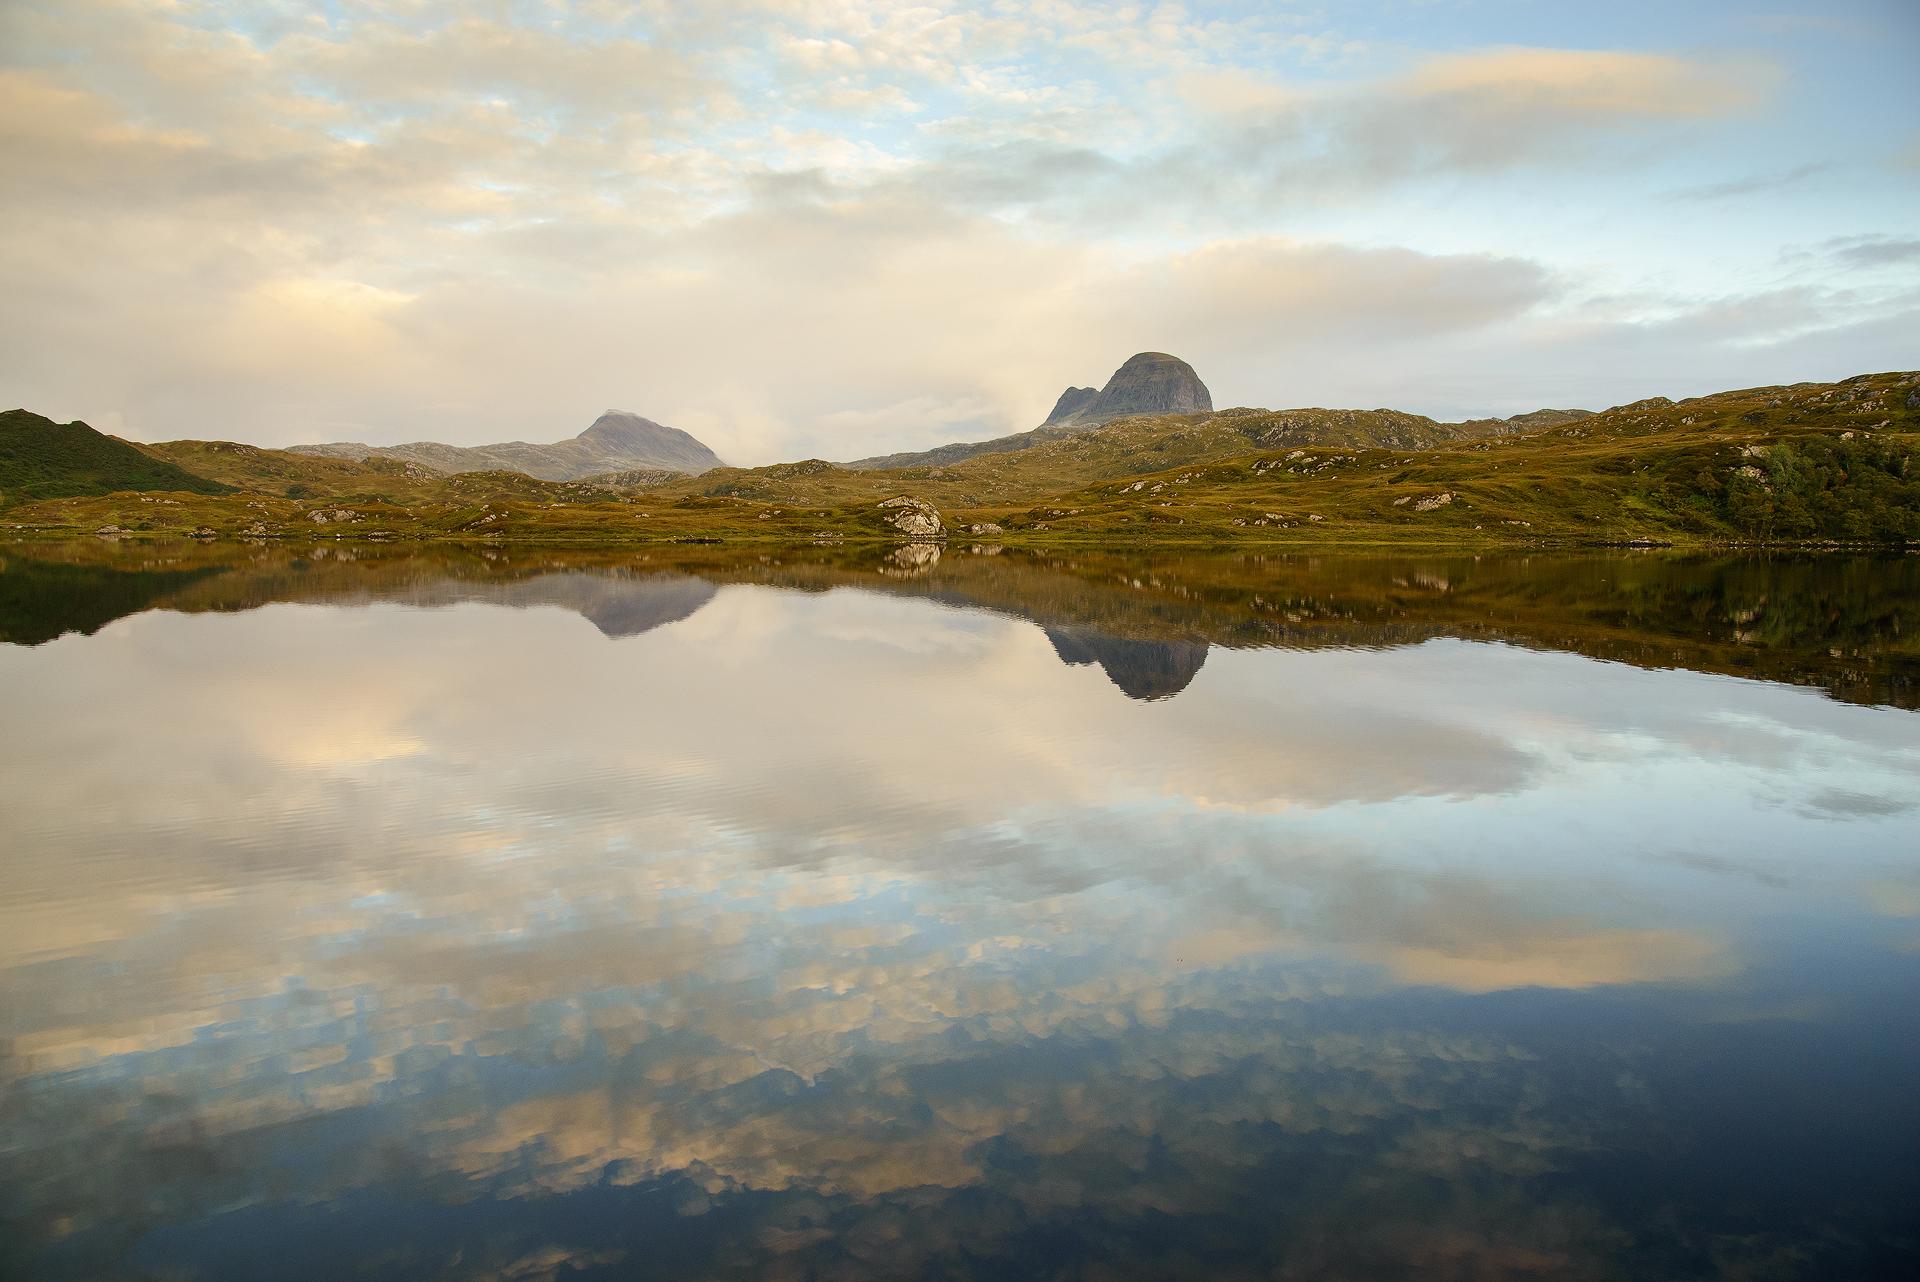 Suilven & Canisp, Loch Druim Suardalain